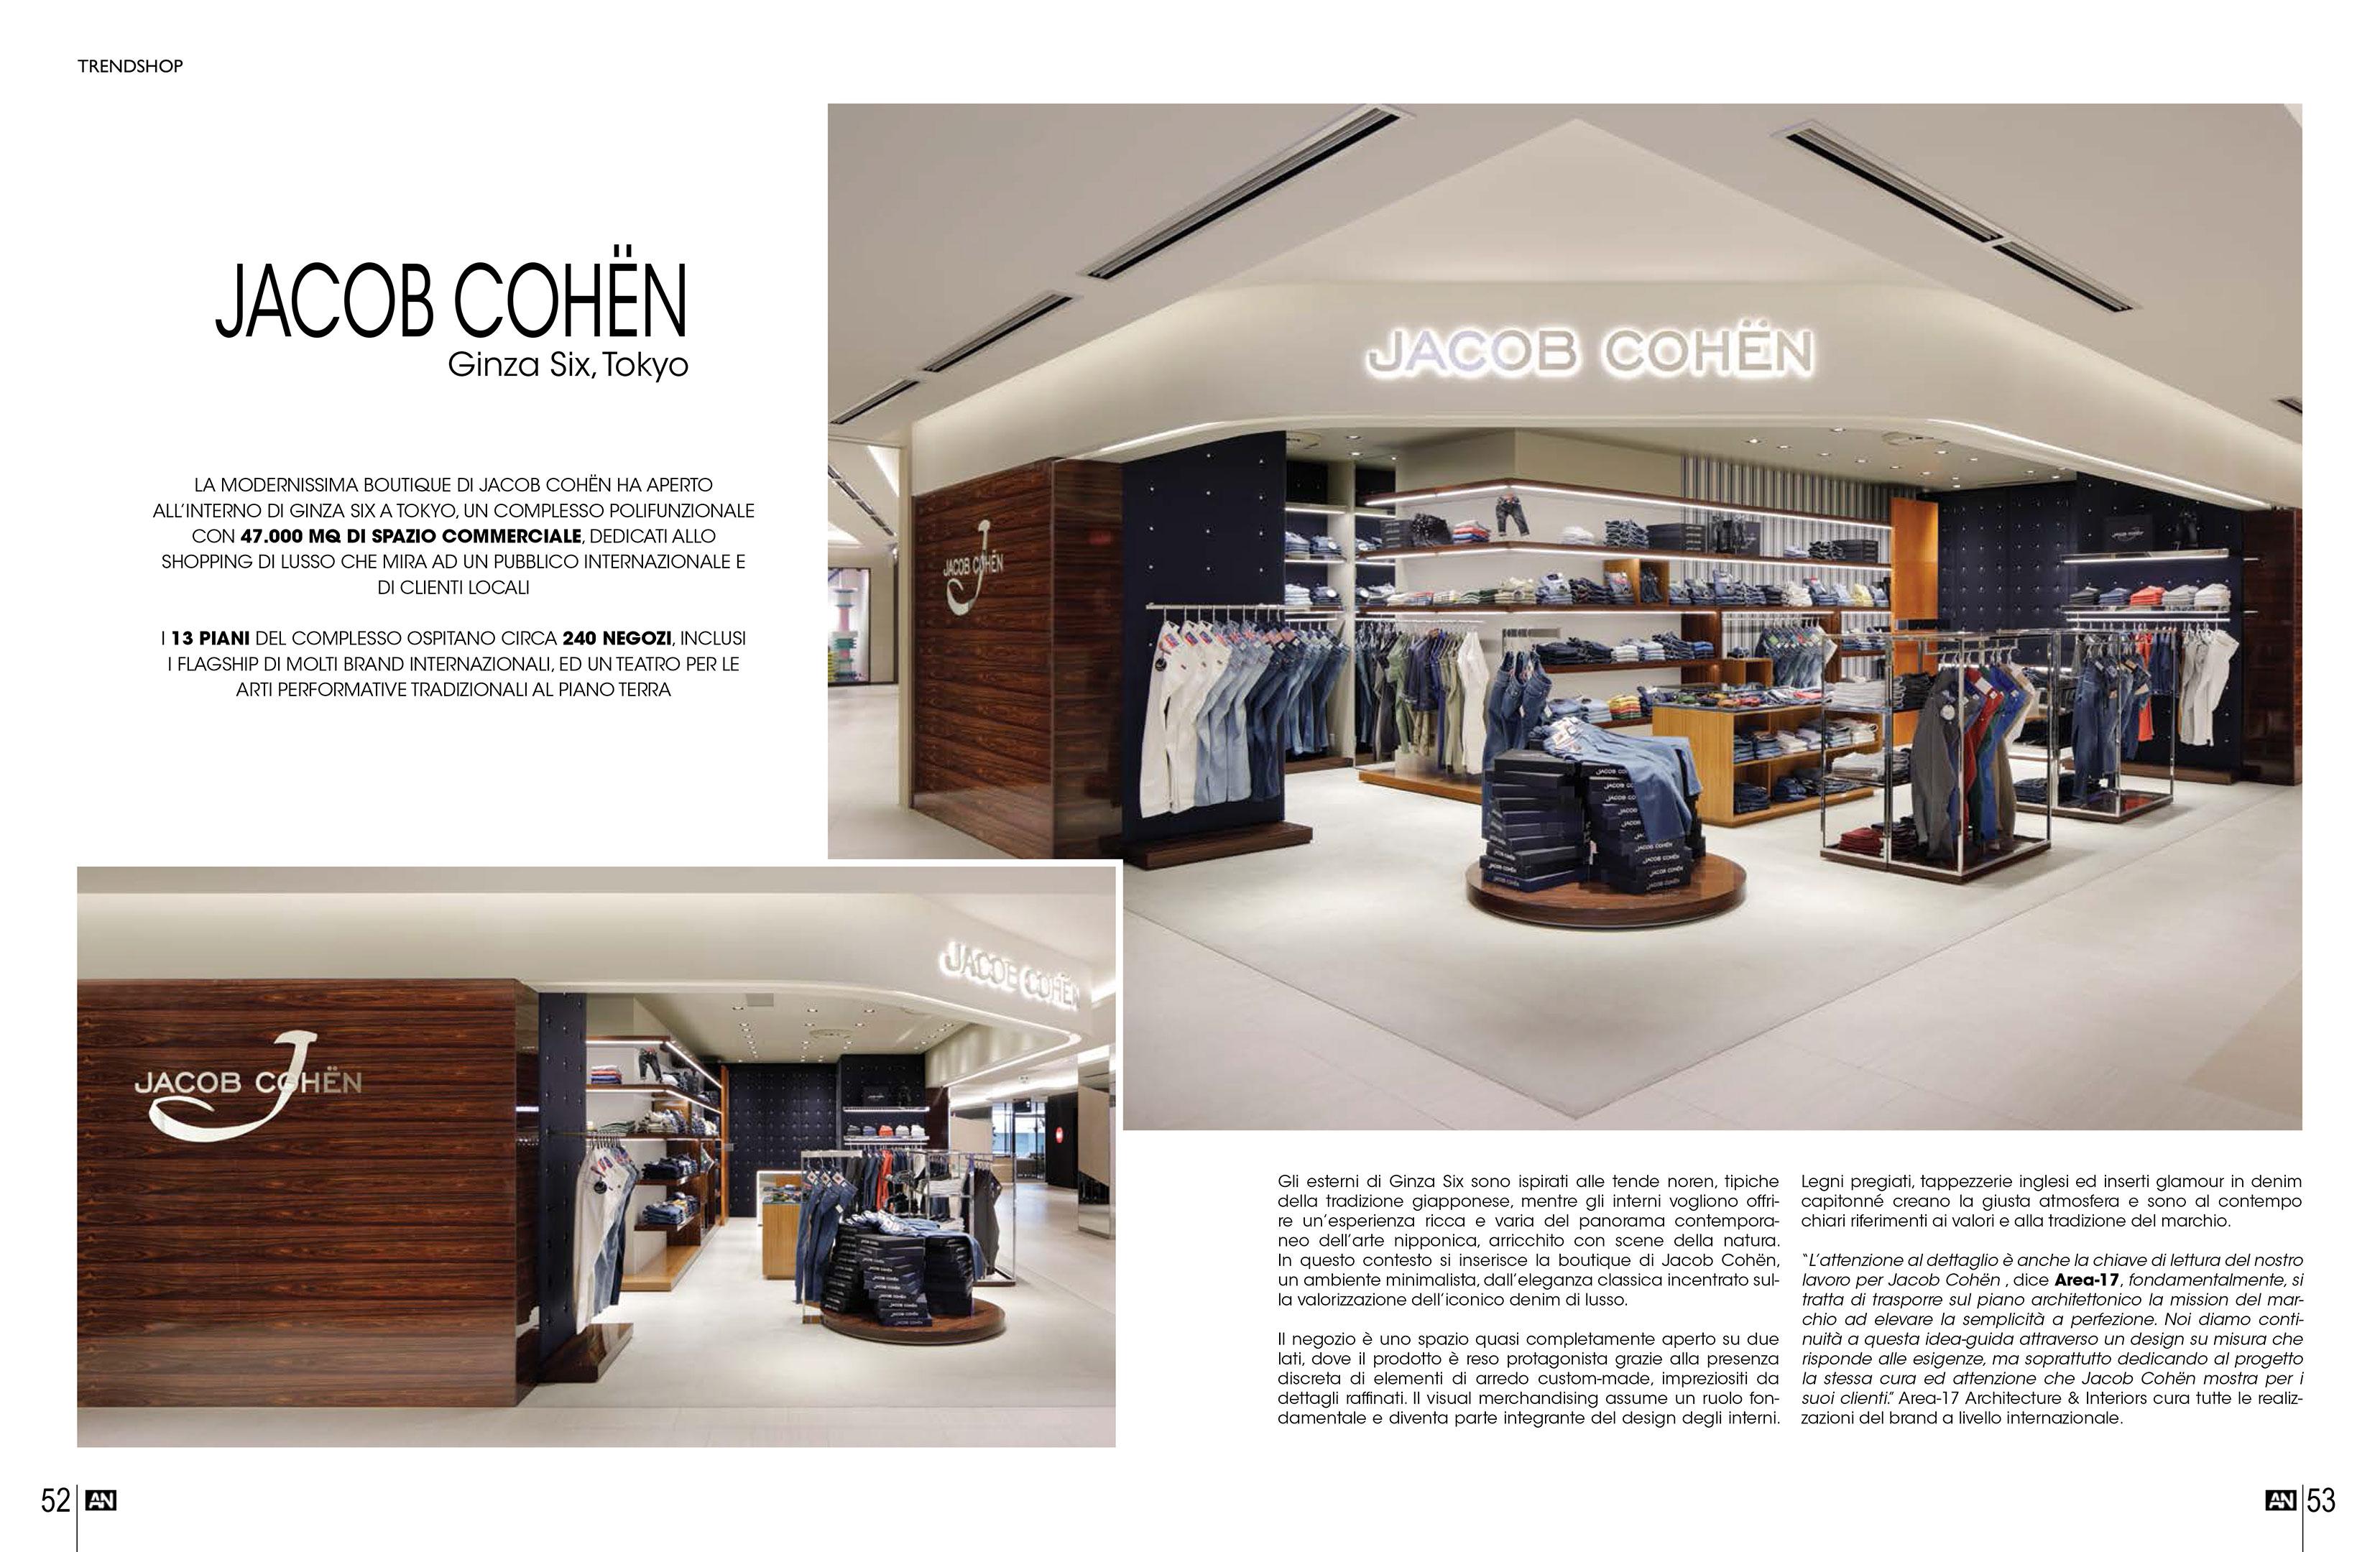 Jacob cohen tokyo on an shopfitting magazine area 17 for Arreda negozi shop